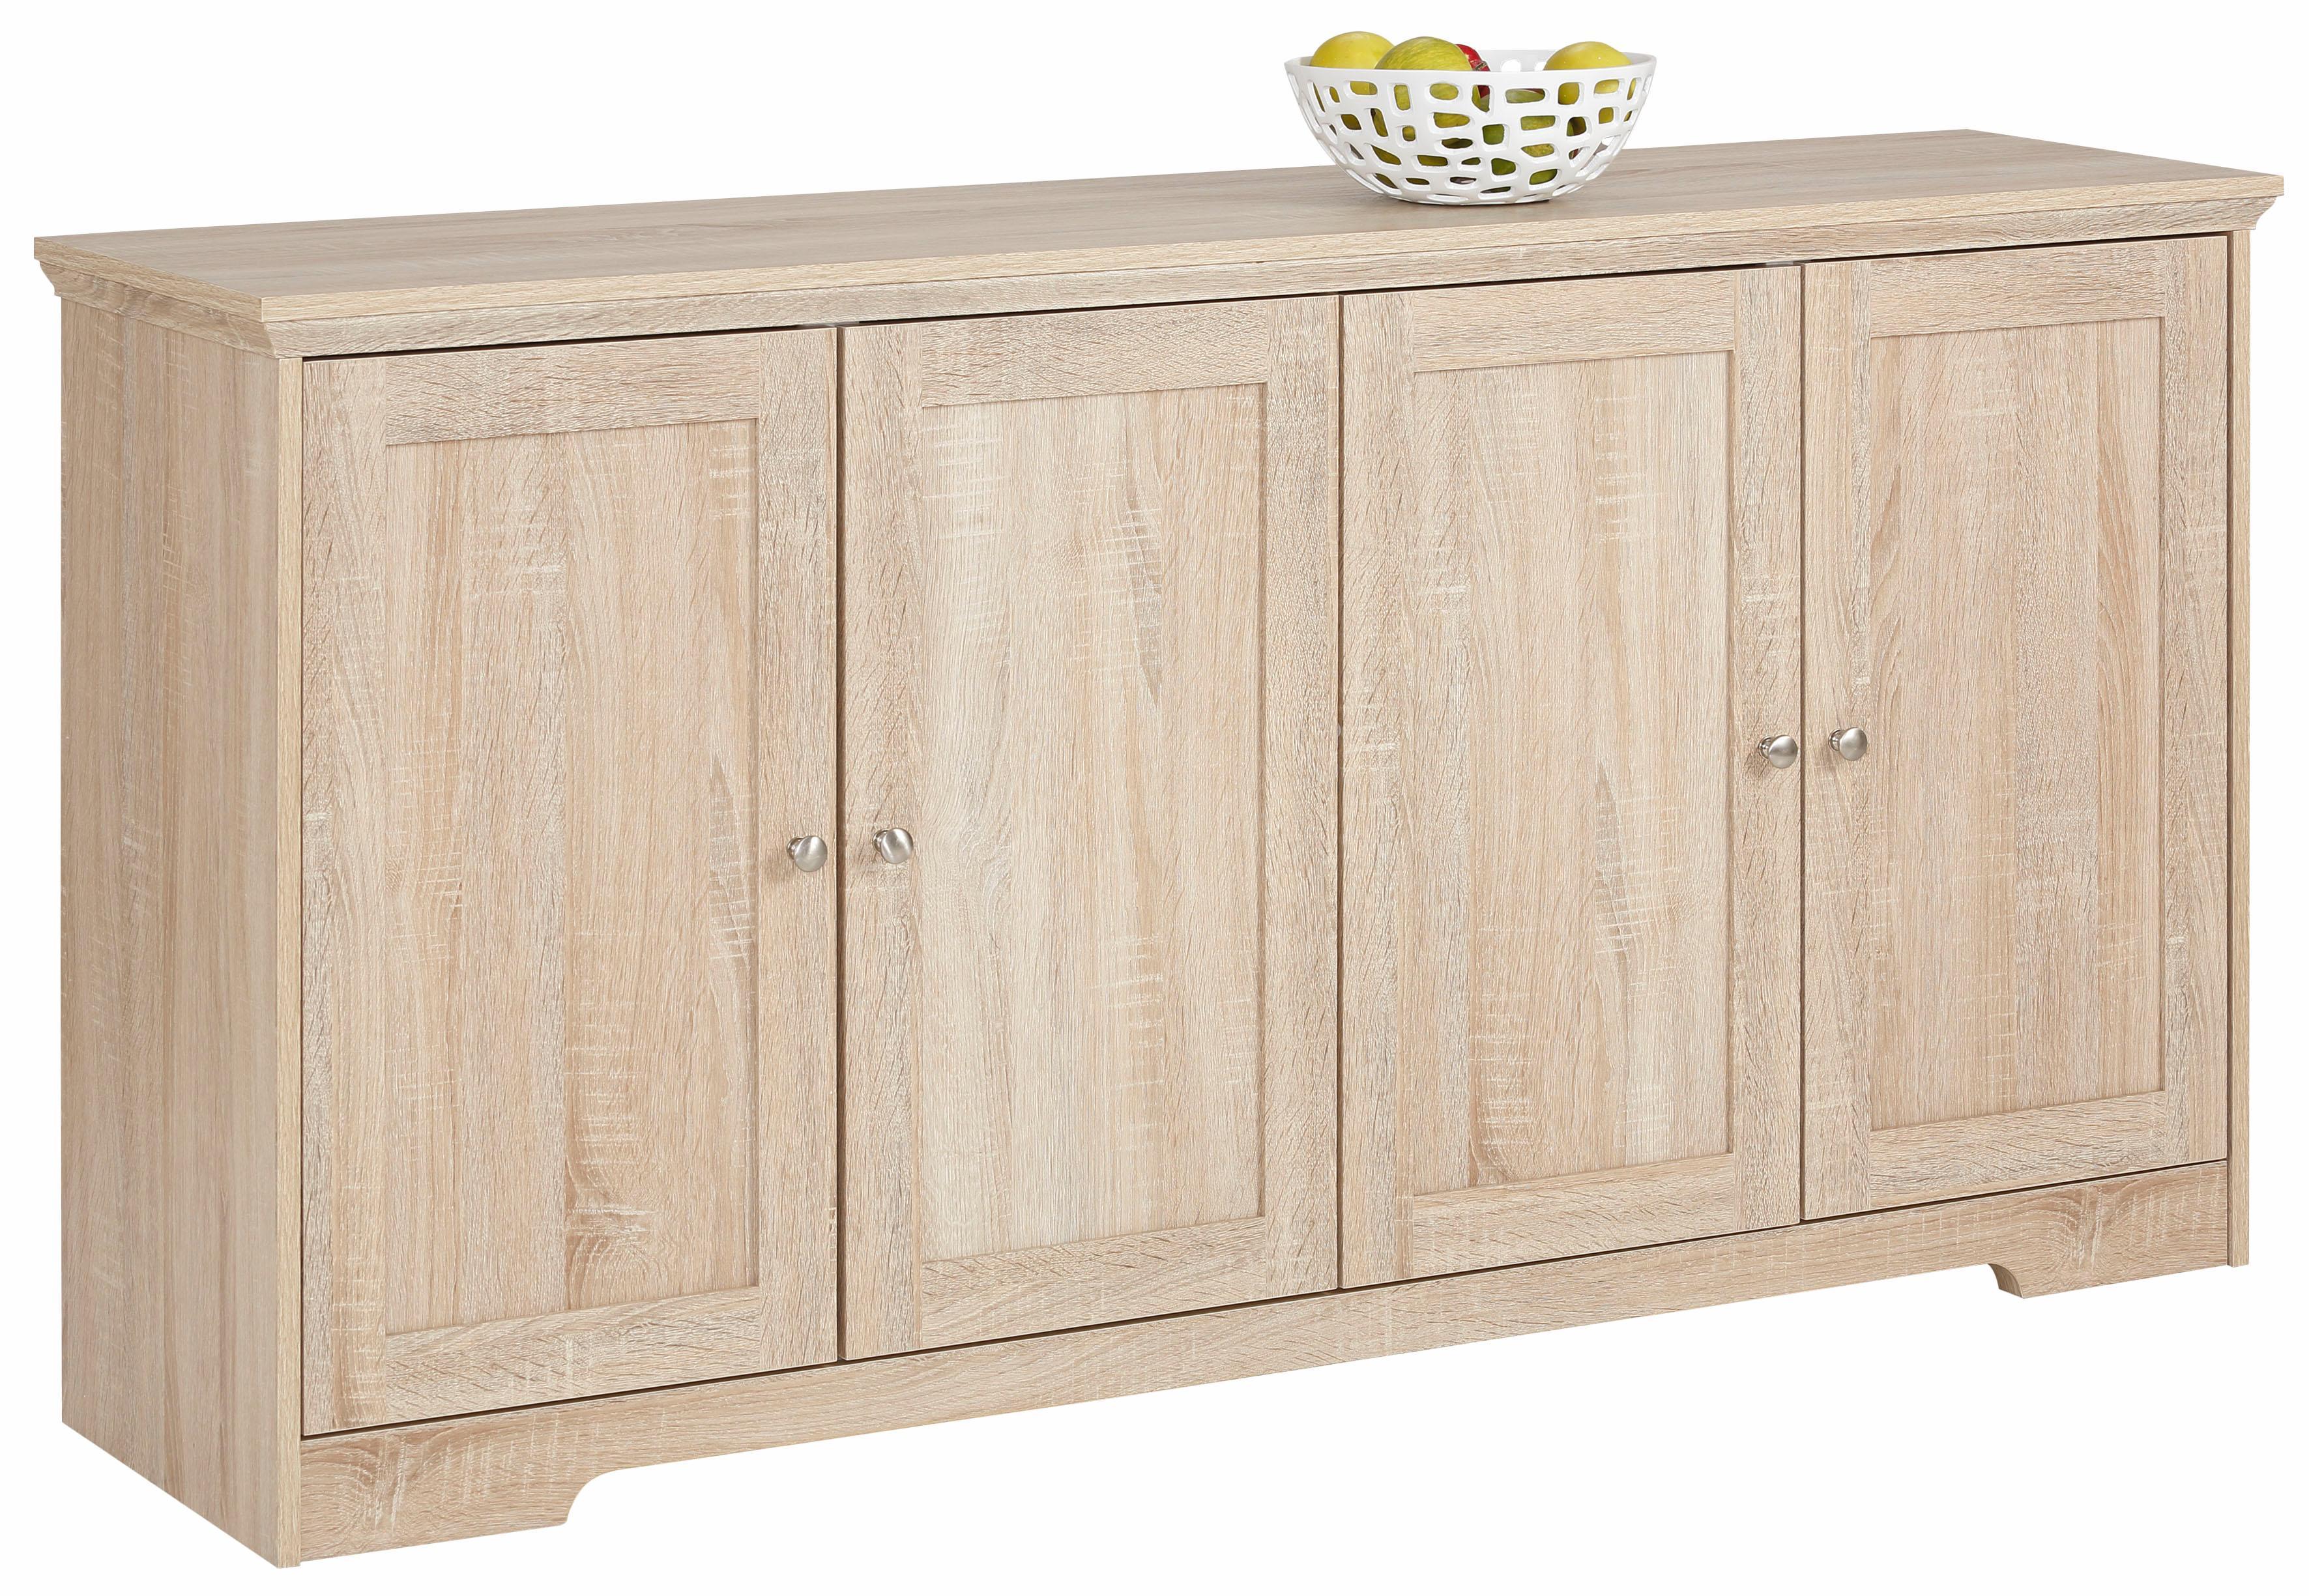 Home affaire Sideboard Nanna Breite 155 cm